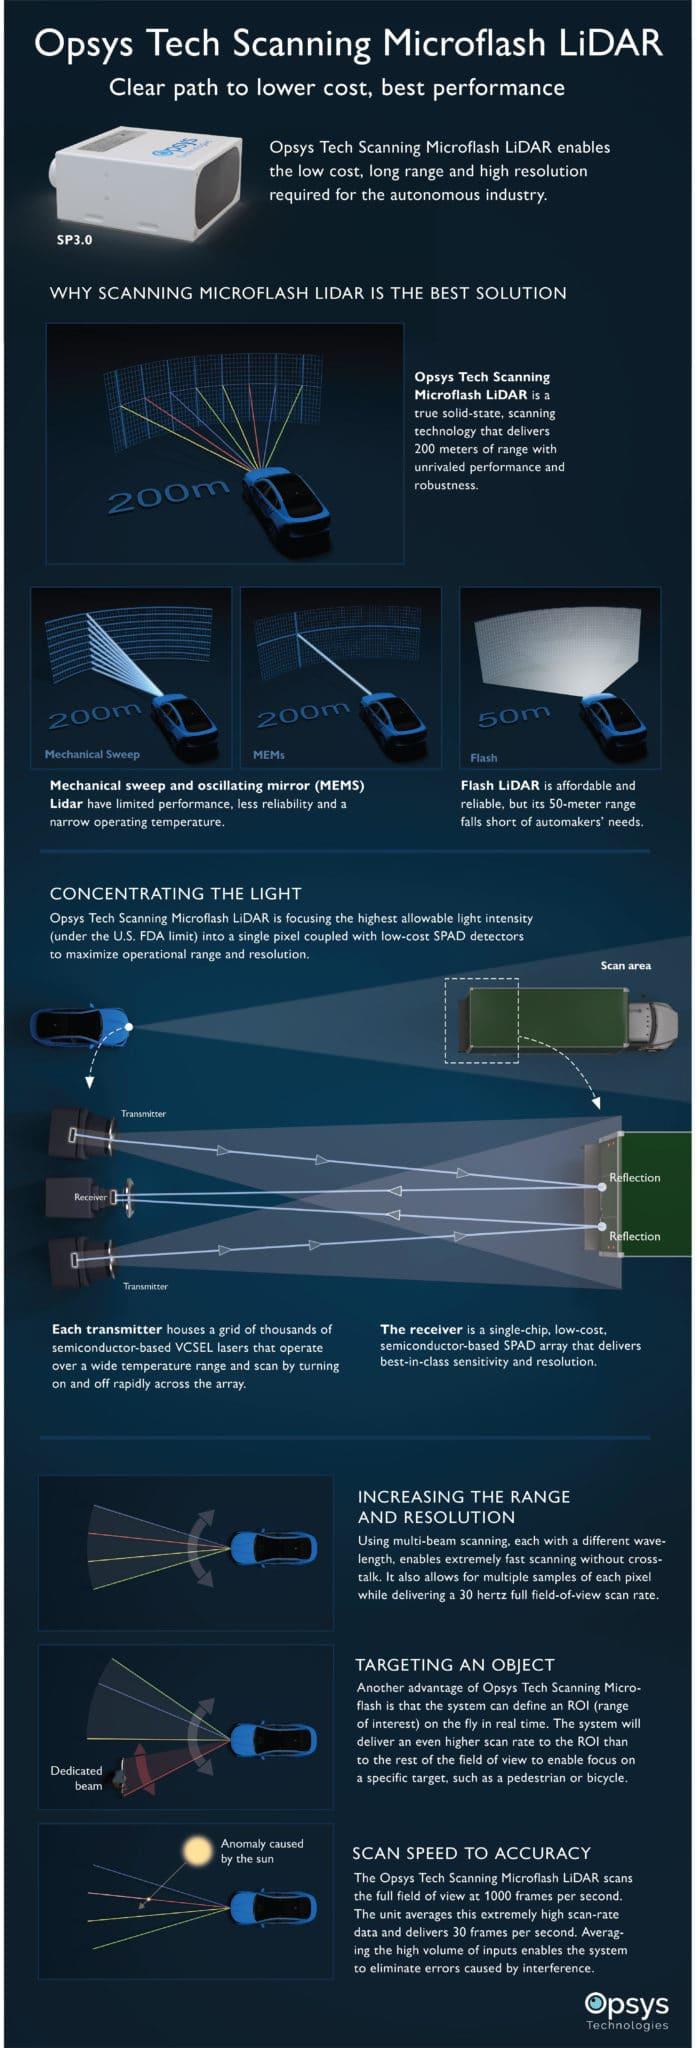 Opsys Tech Scanning Microflash LiDAR infographic.